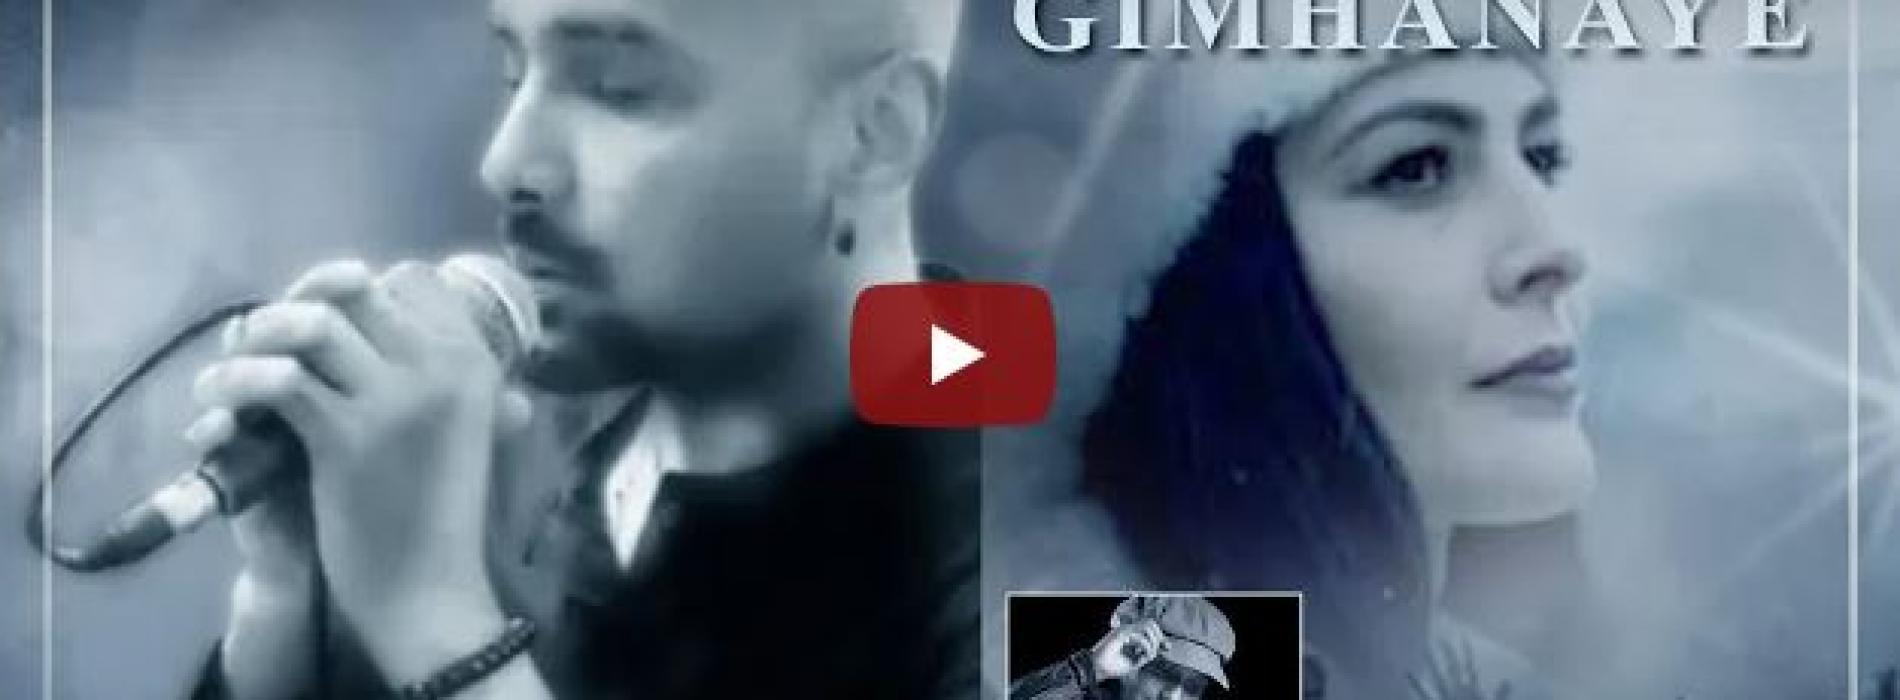 New Music : Gimhanaye   ගිම්හානයේ – Sanjay Alles ft Nisha